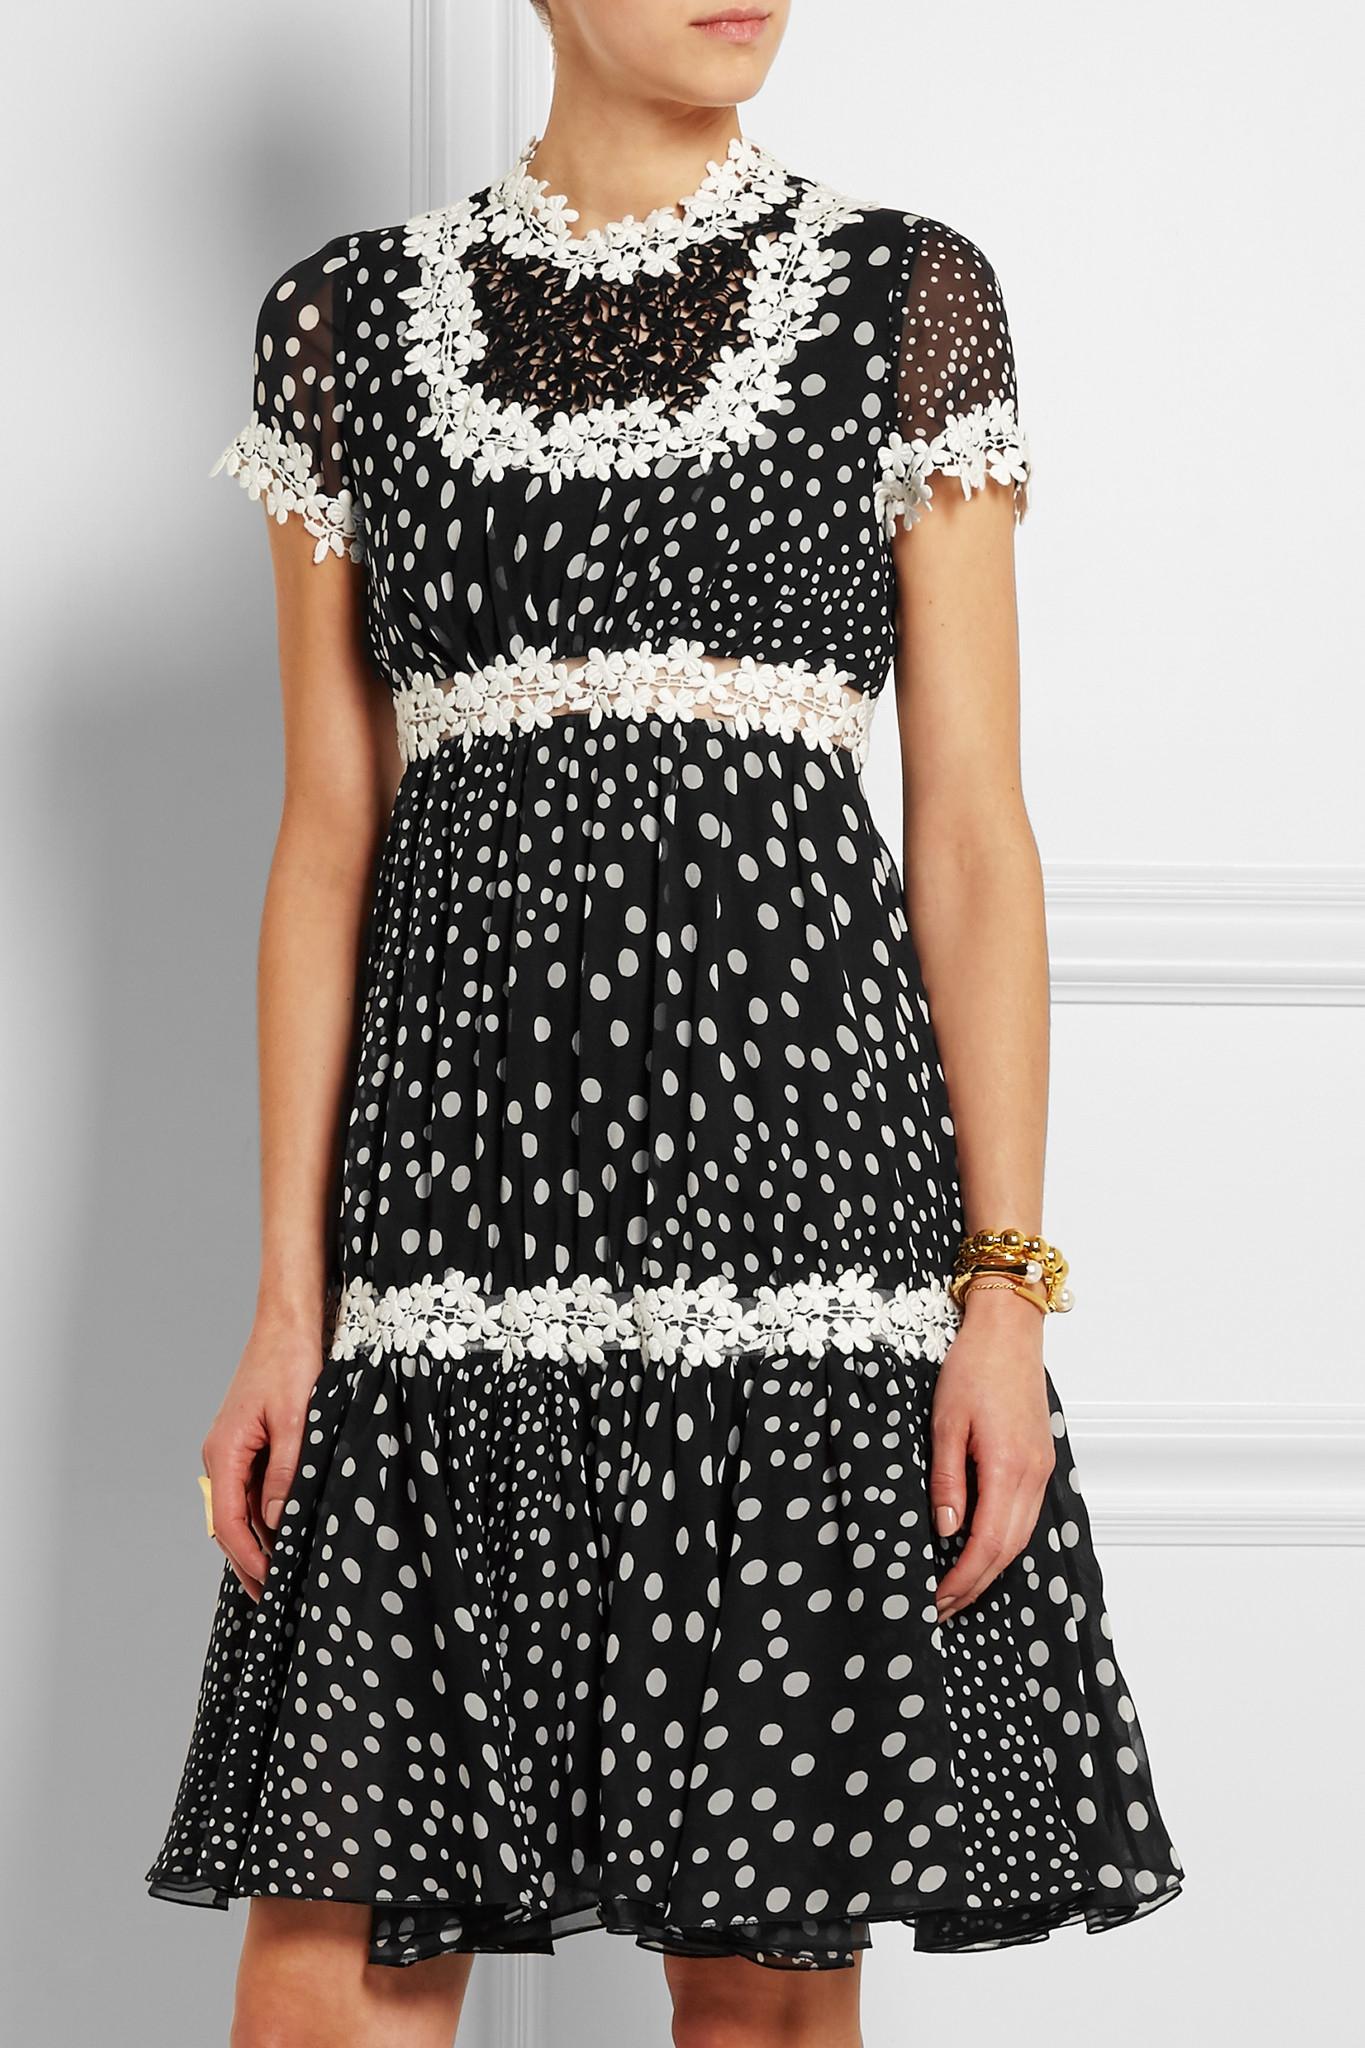 0a4c092e836 Lyst - Giambattista Valli Lace-trimmed Polka-dot Silk-georgette Dress in  Black